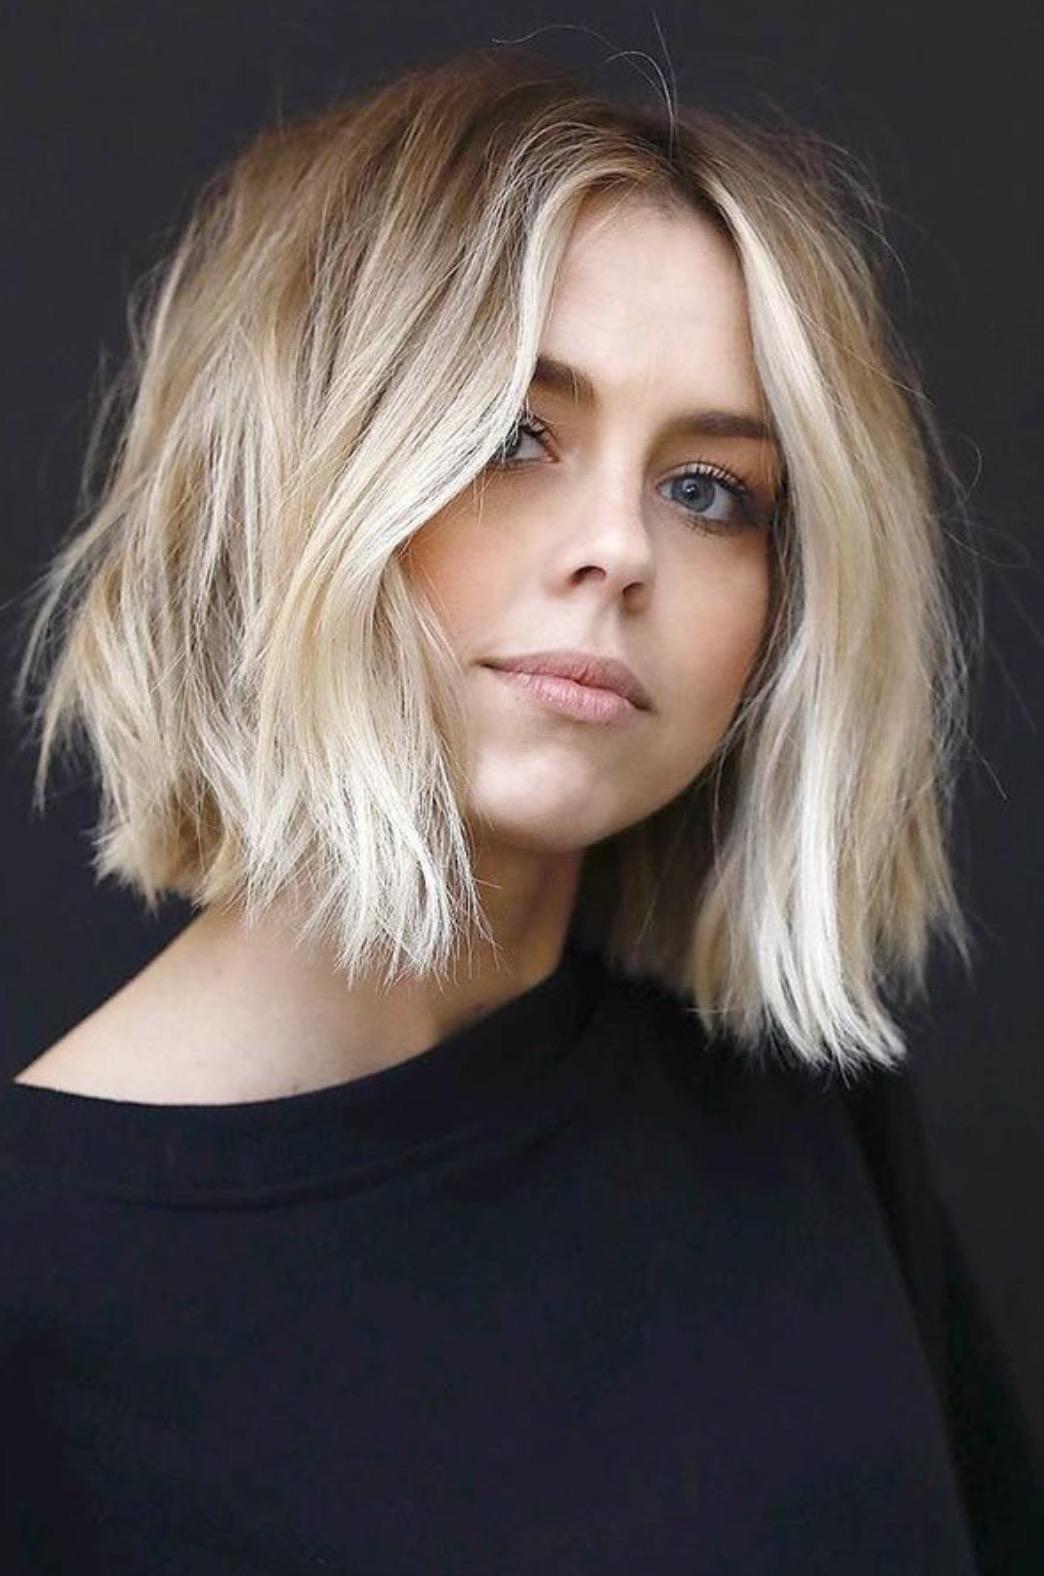 Quelle Coupe De Cheveux Adopter Quand On En Perd Beaucoup Cosmopolitan Artley